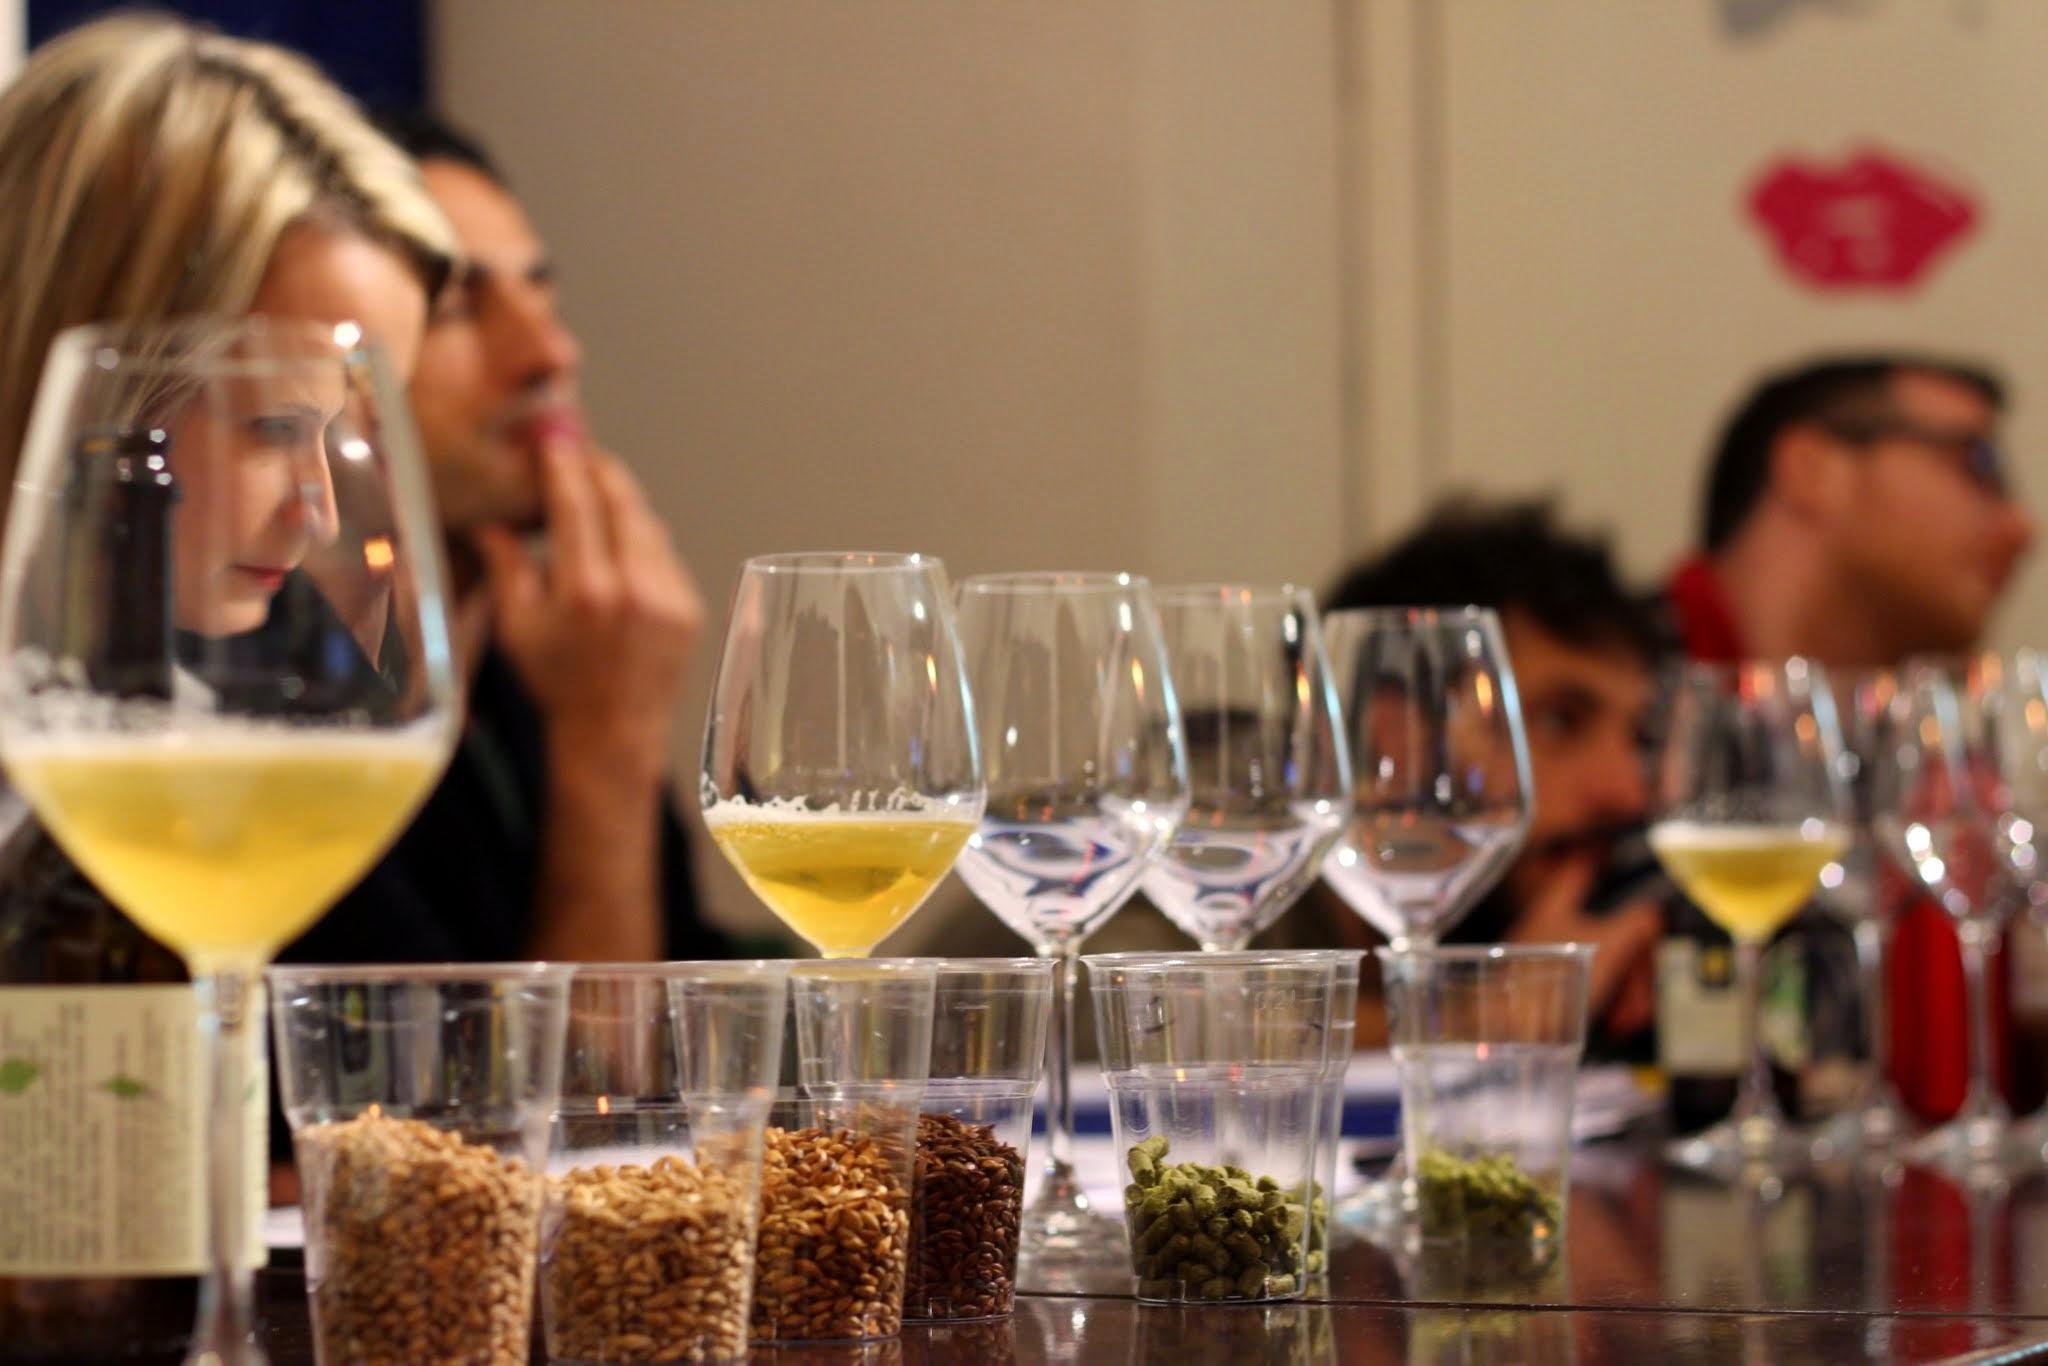 A Bologna al via i corsi per degustatori di birra